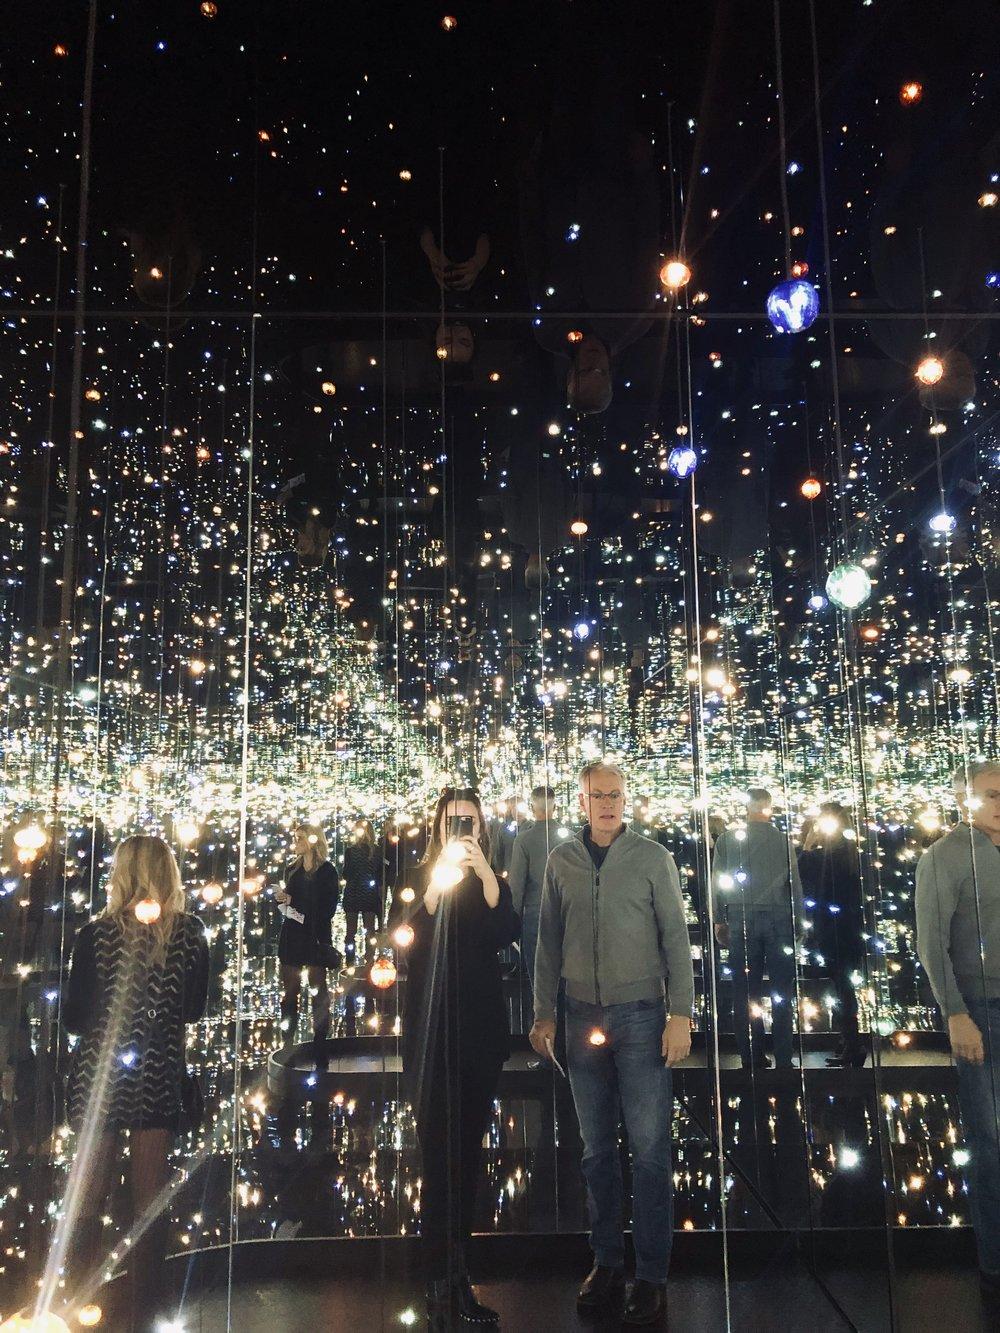 infinity mirrors 3